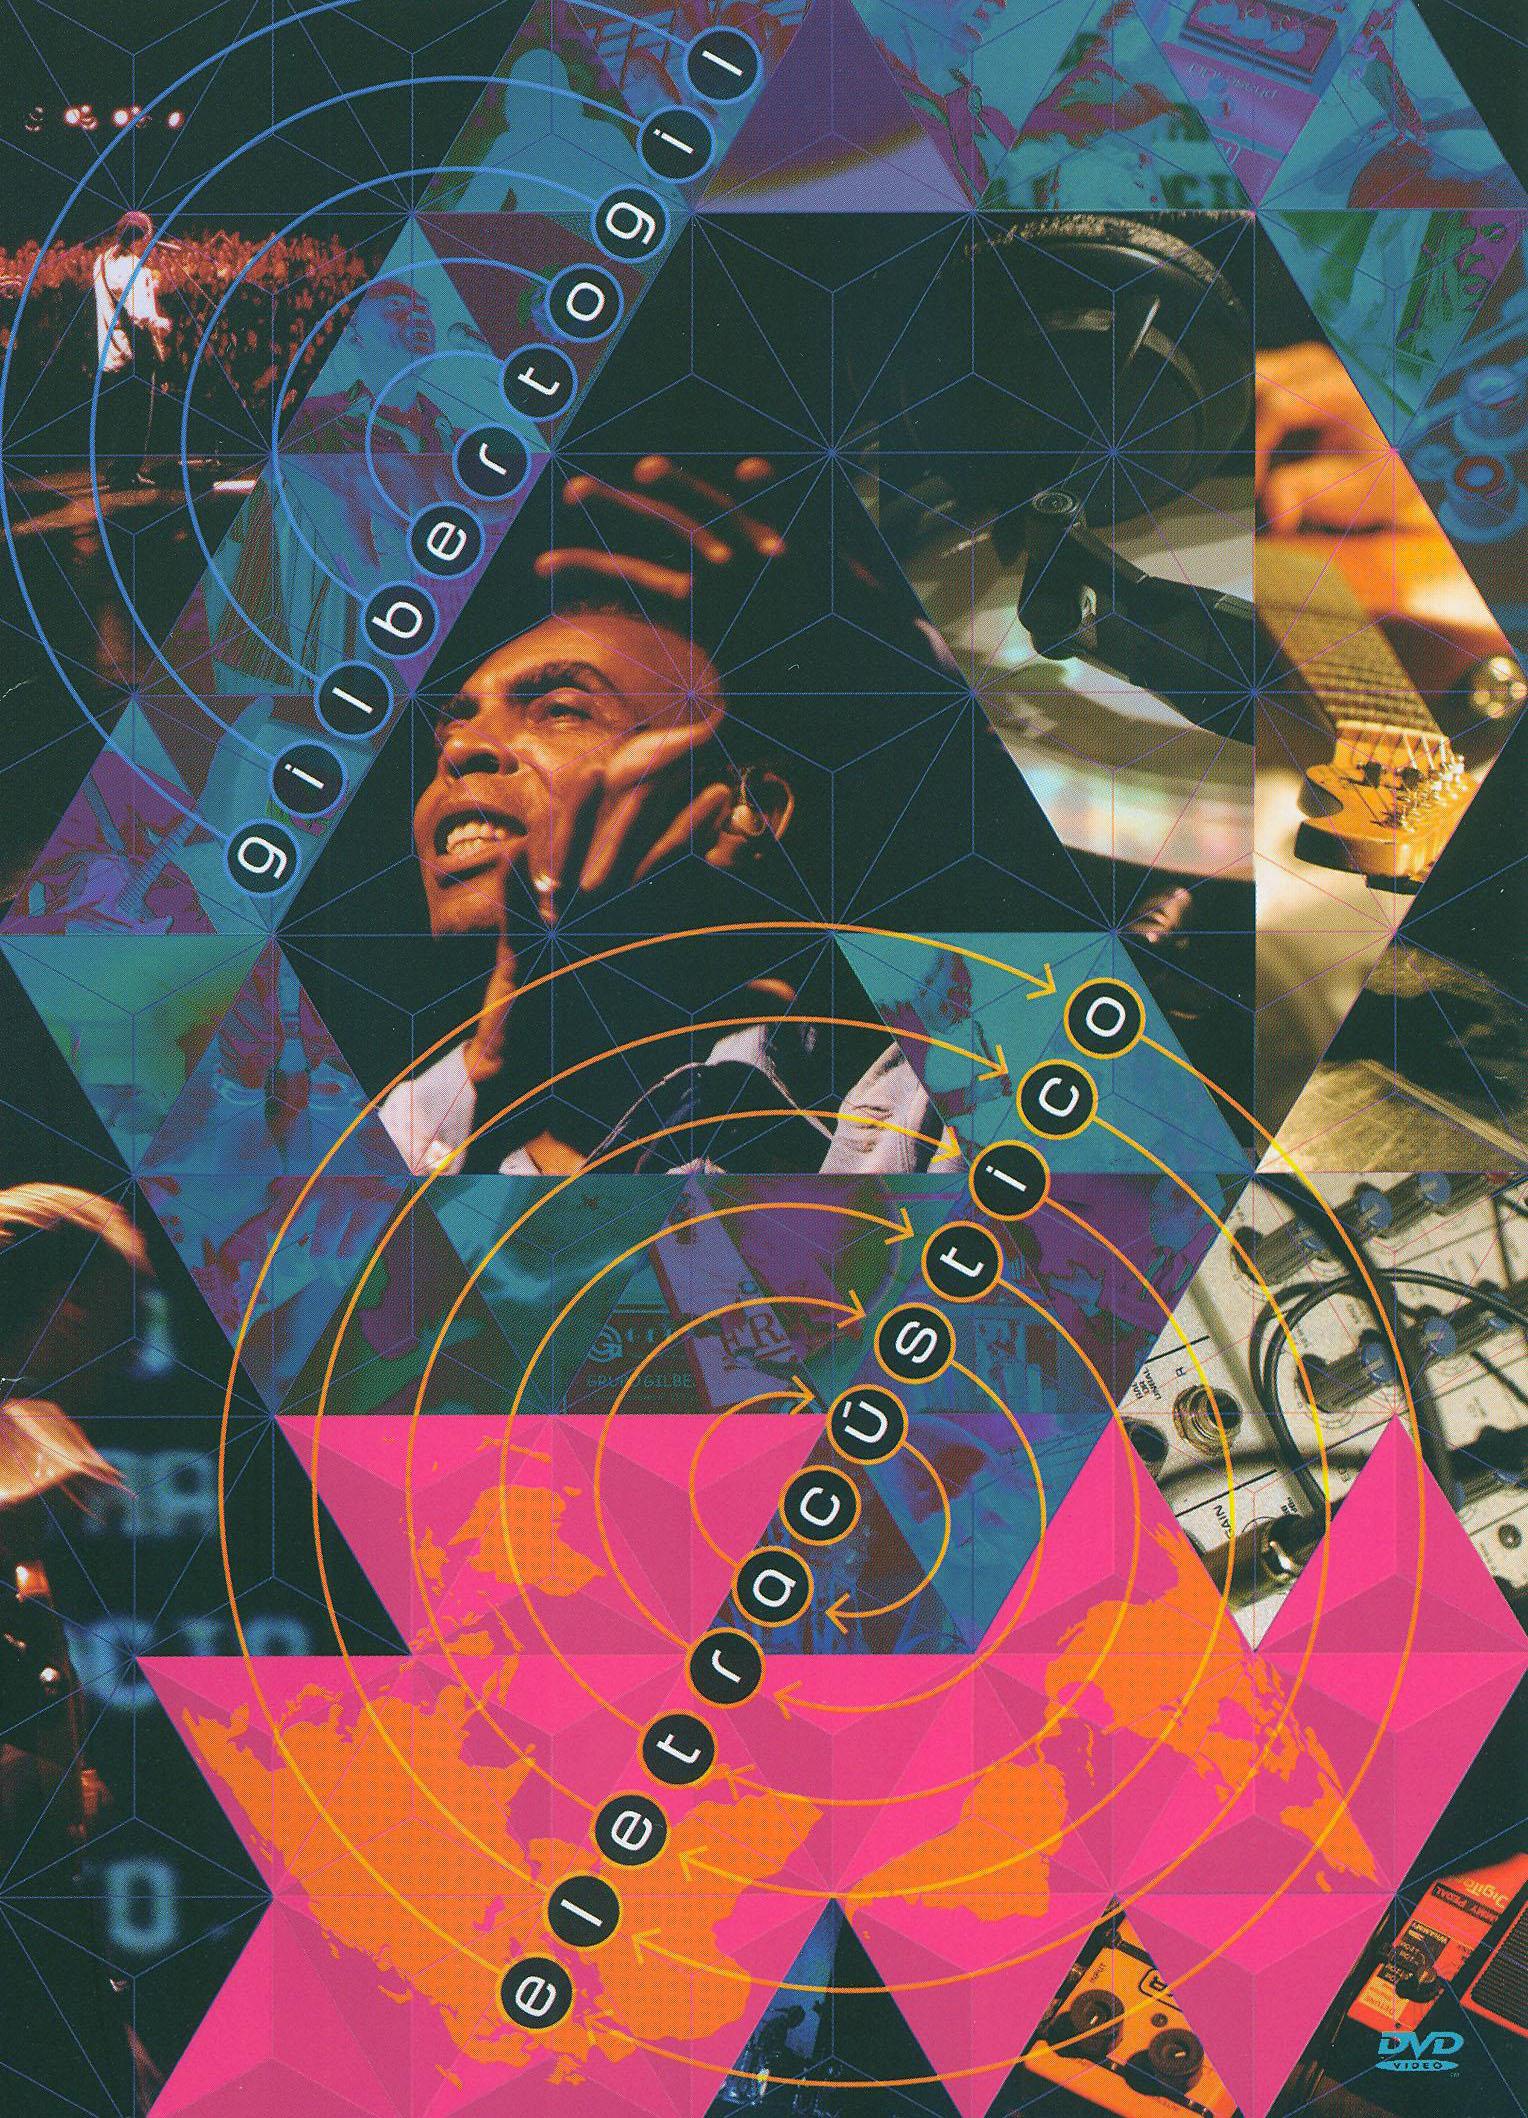 Gilberto Gil: Electroacustico